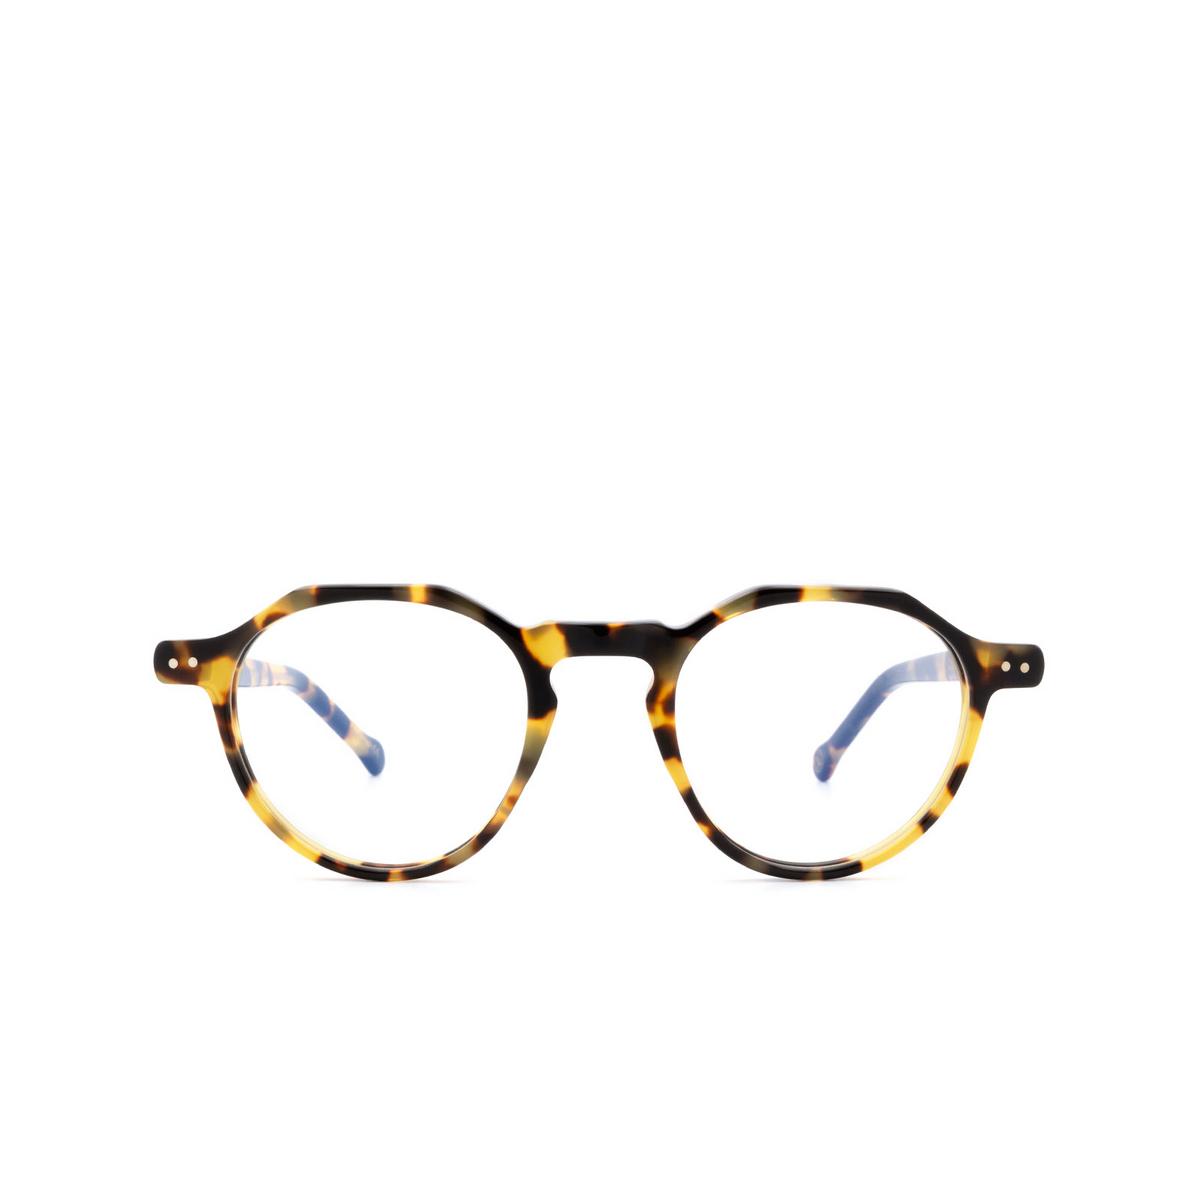 Lesca® Irregular Eyeglasses: Icon color Havana 228 - front view.